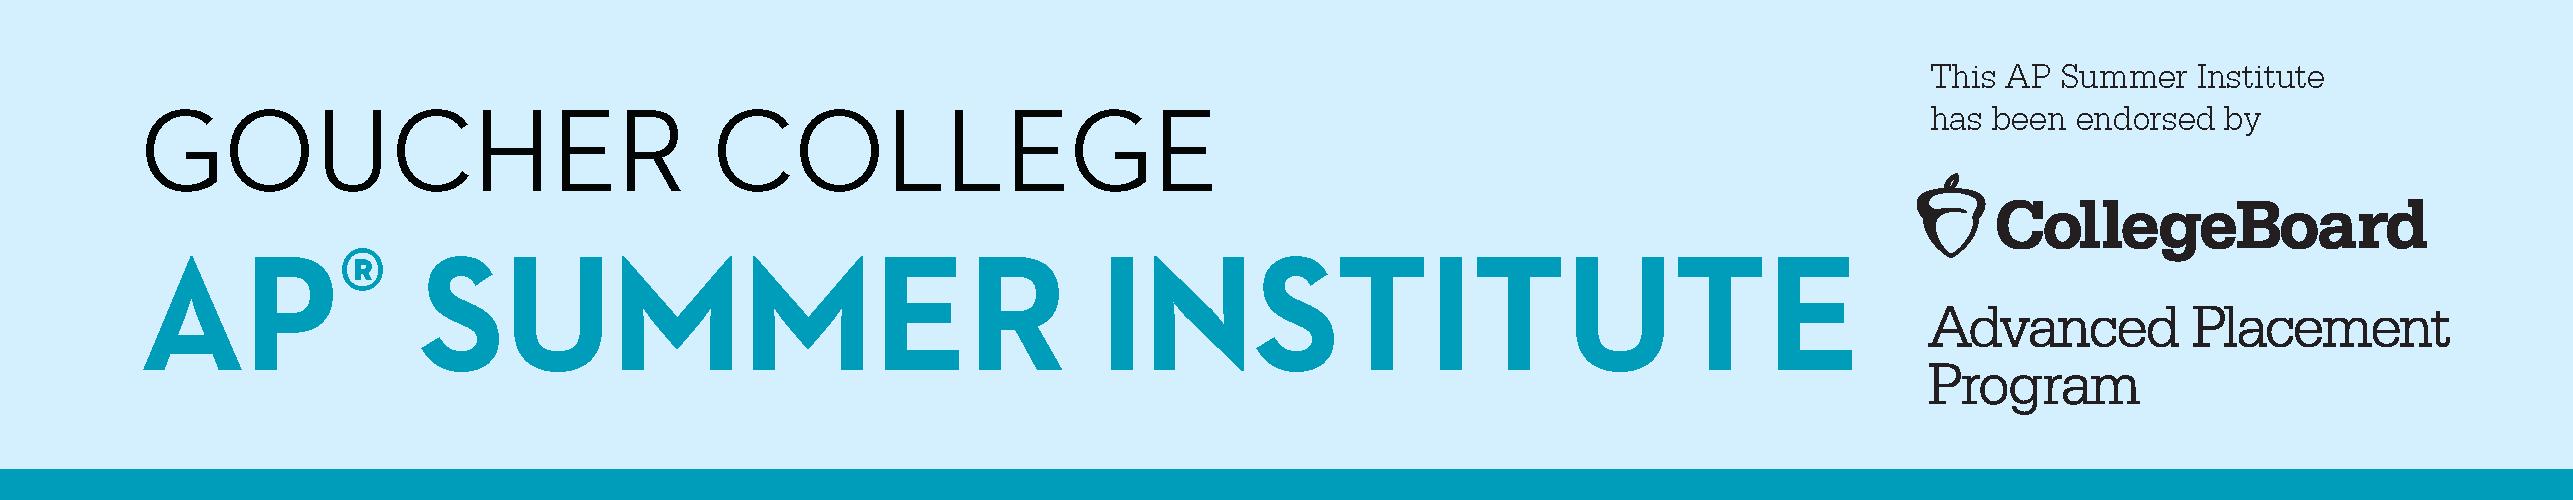 Goucher College Virtual AP Capstone  July 20-24, 2020 (4.5 days)